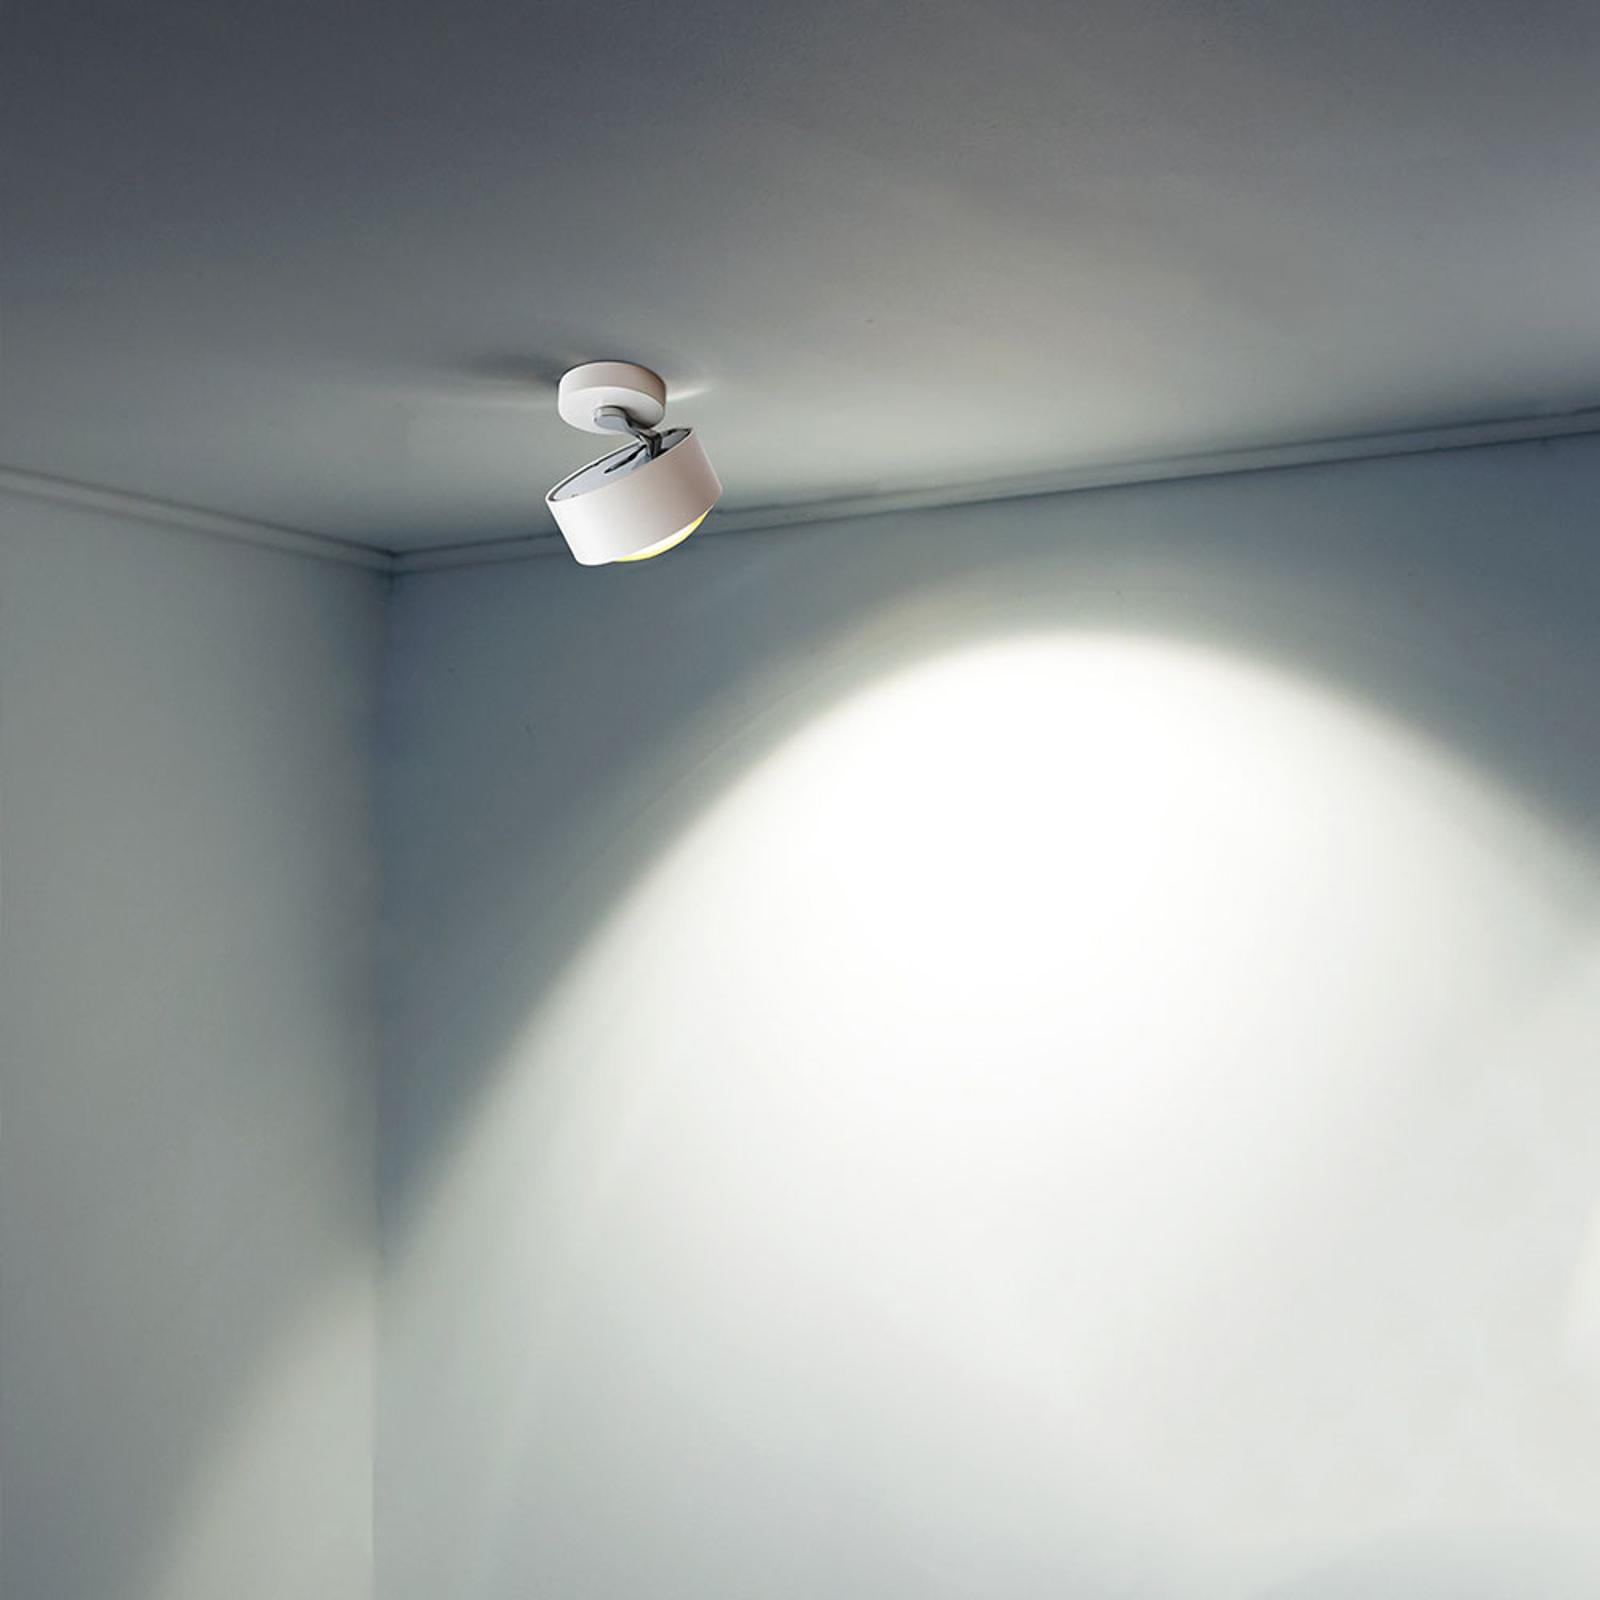 Lampa sufitowa LED Puk Maxx Move, biała chromowa